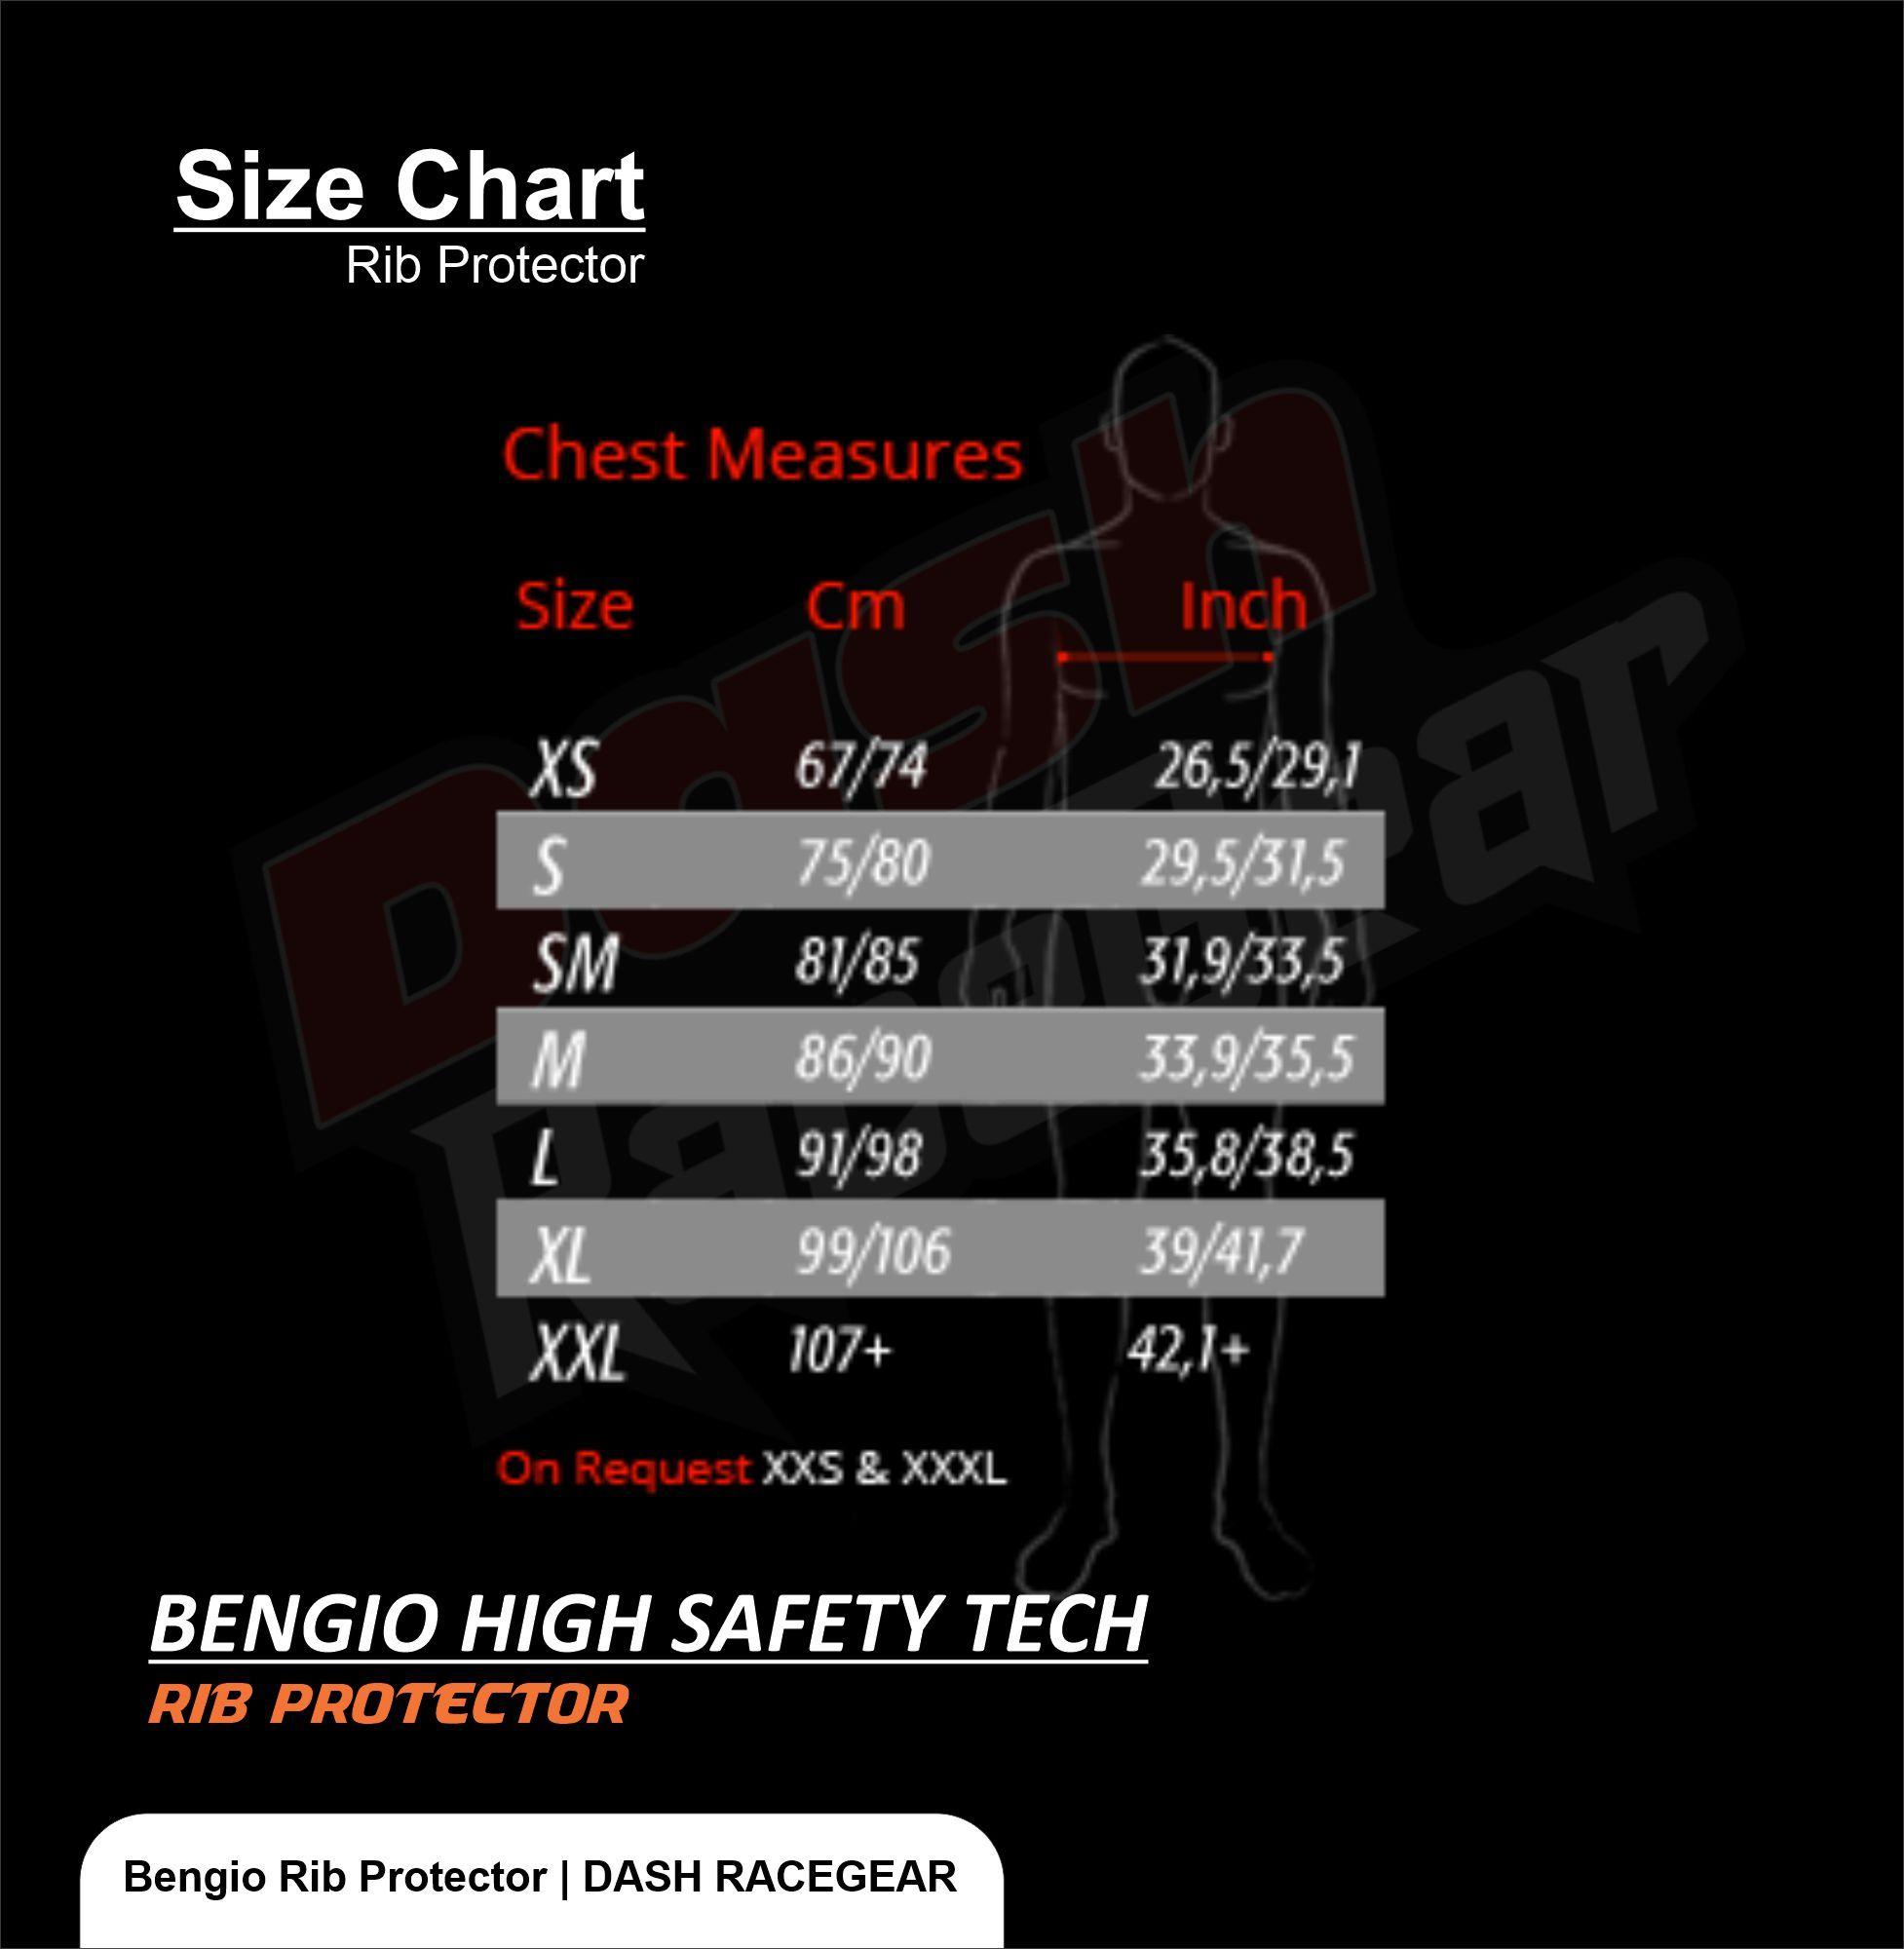 Bengio Bumper Standard Rib Protector In 2020 Fit Back Protector Rib